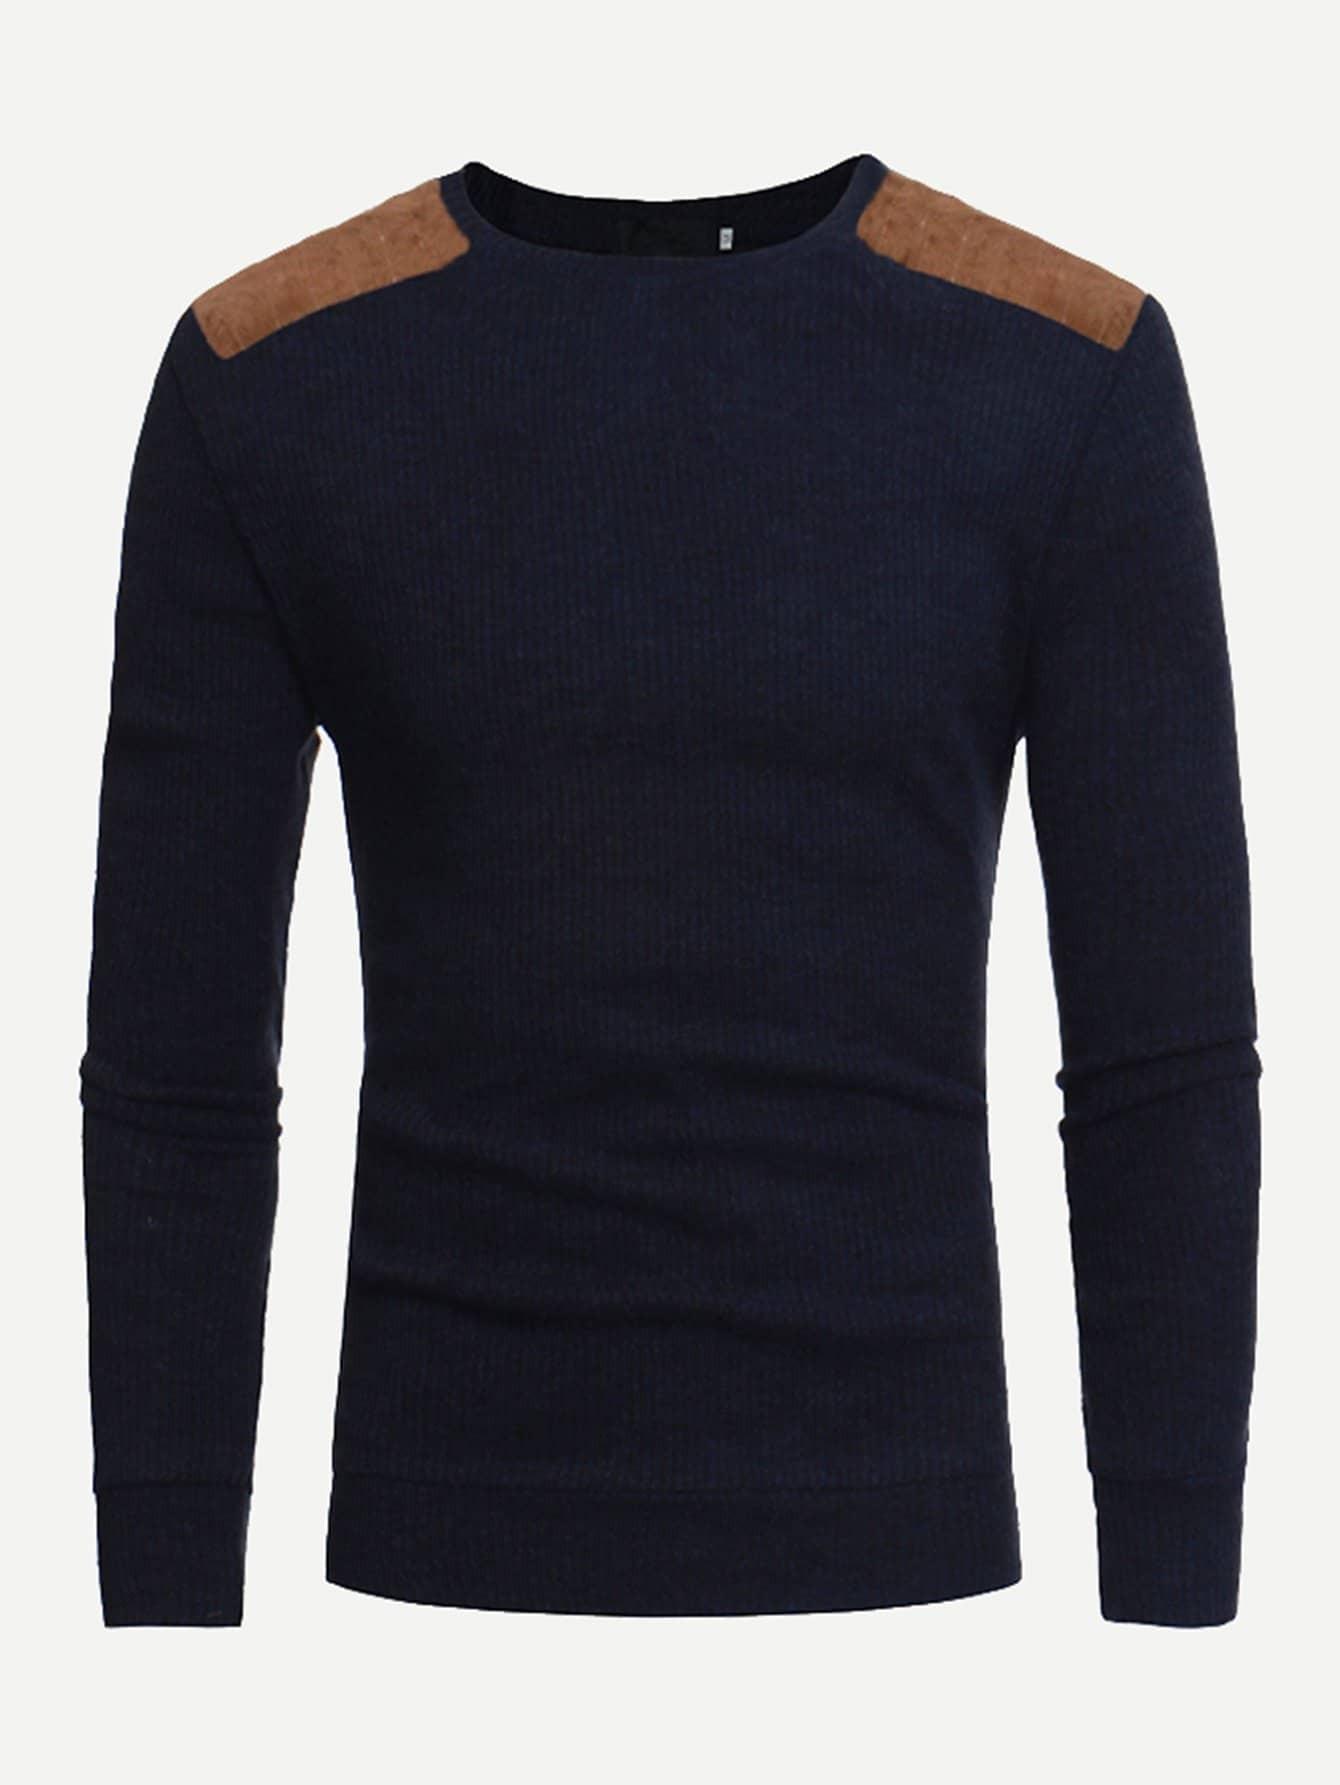 Фото - Мужский контрастный свитер от SheIn тёмно-синего цвета